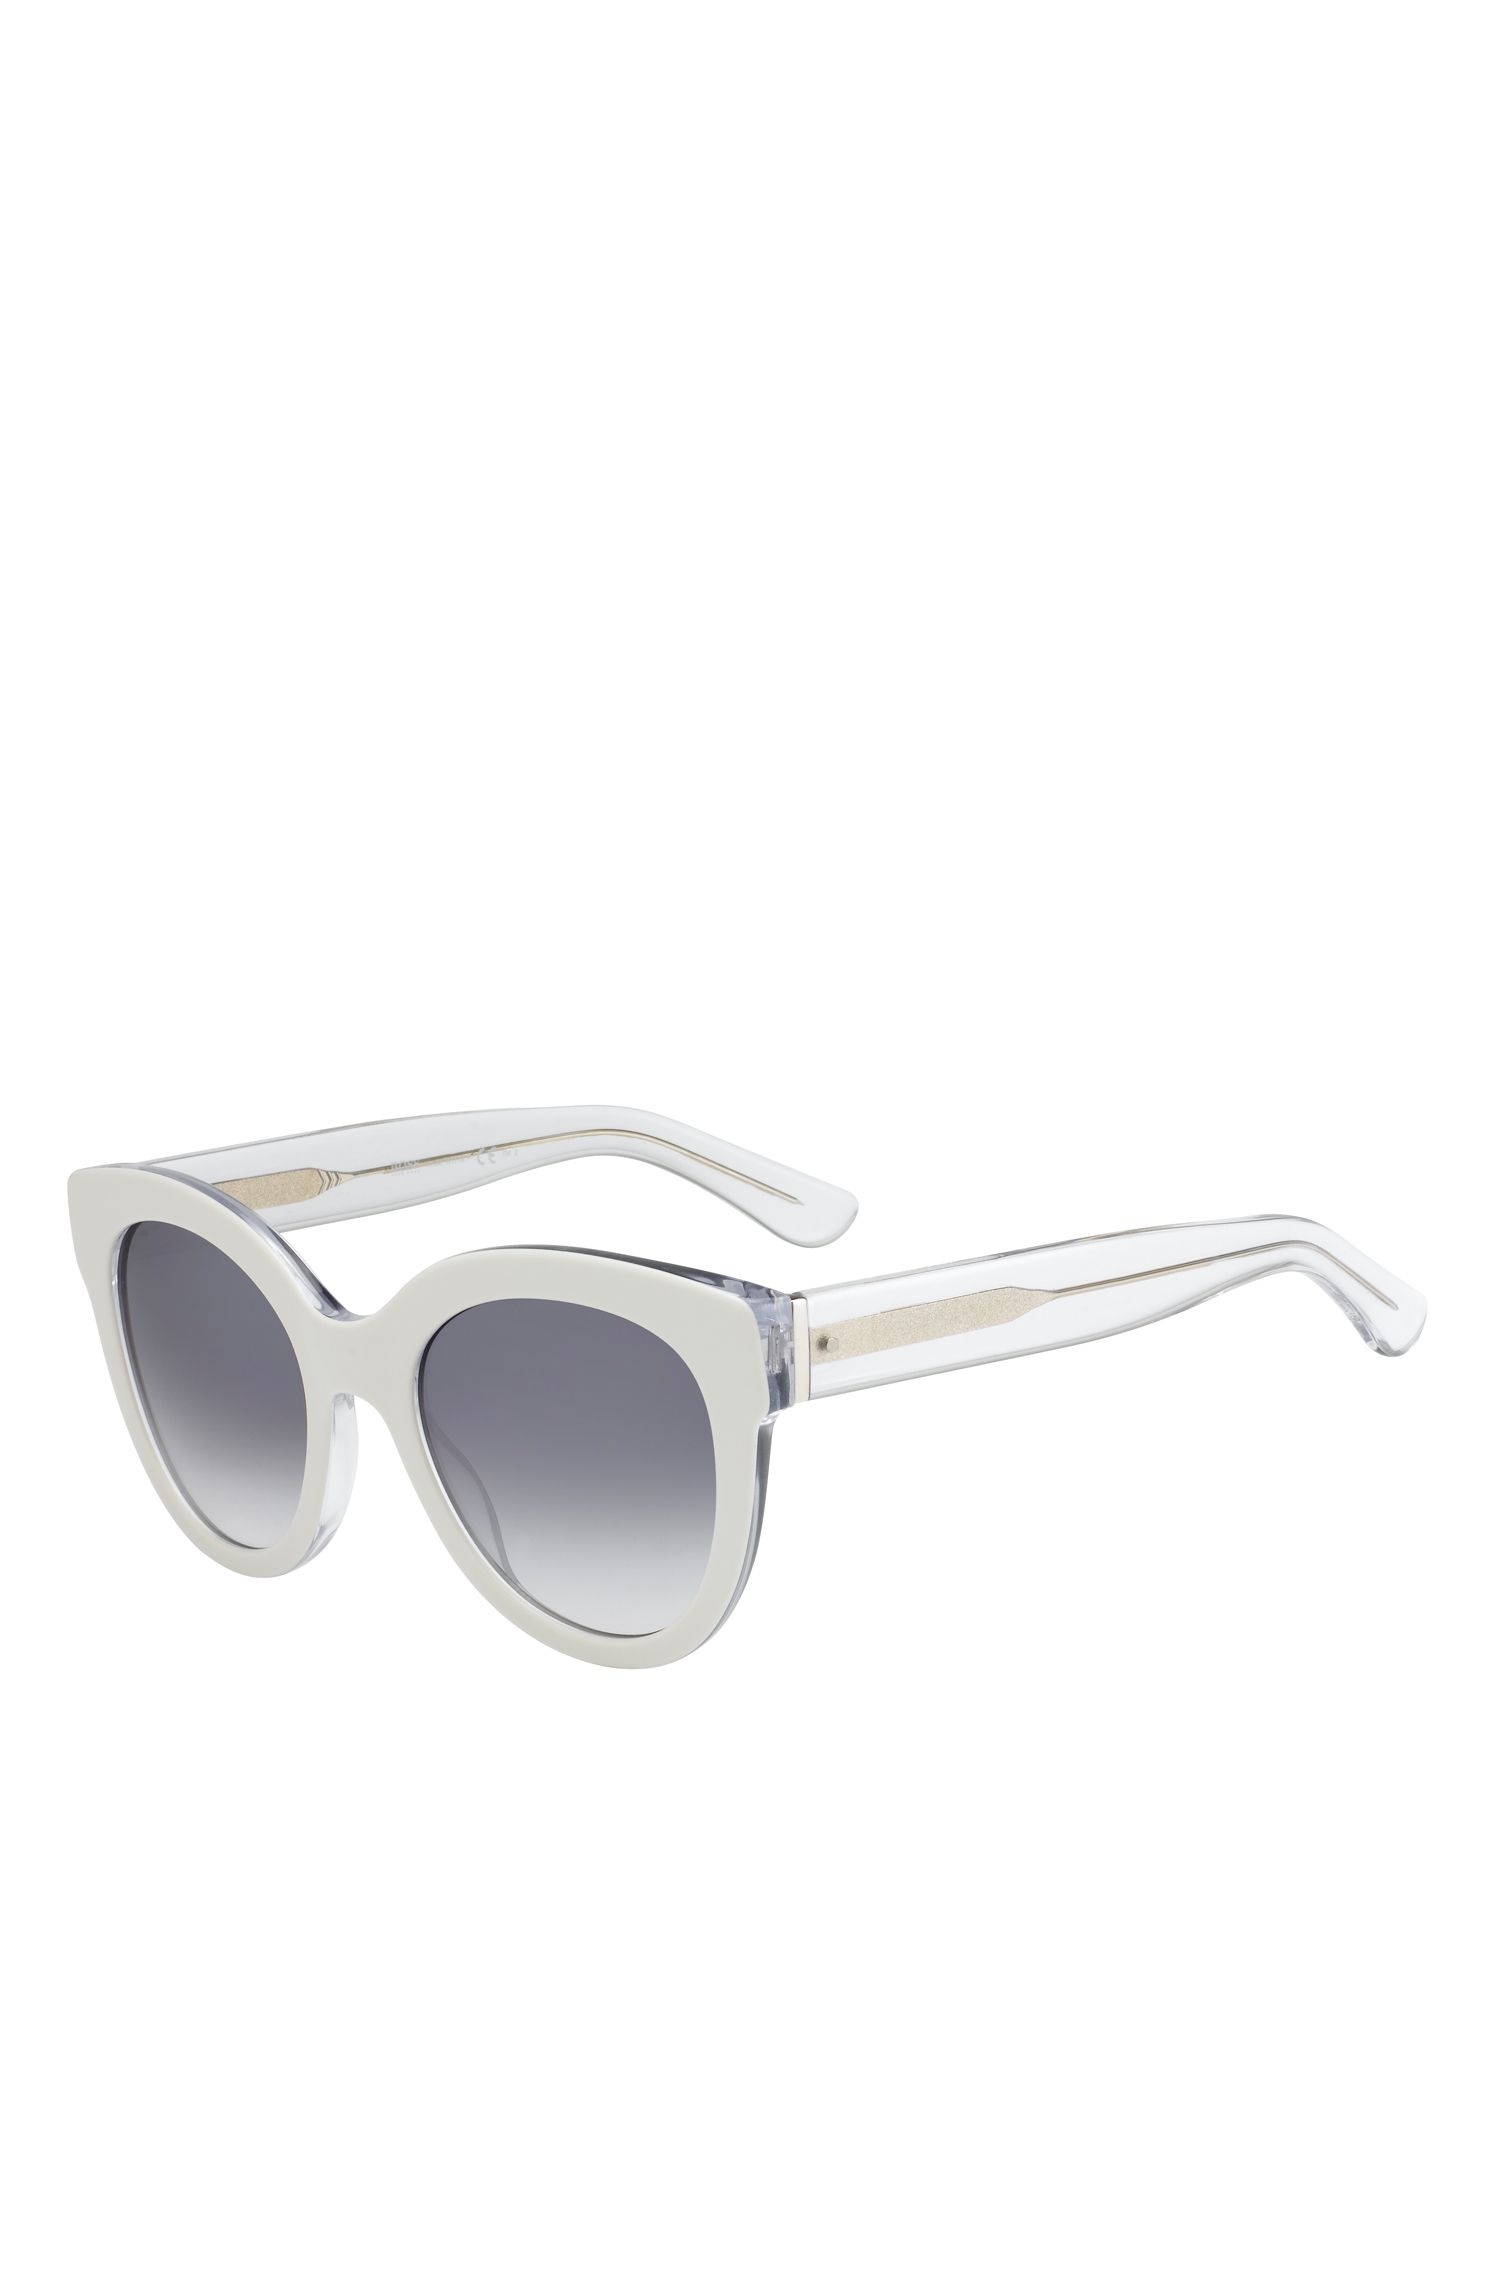 'BOSS 067S' | Cateye Gradient Lens Sunglasses